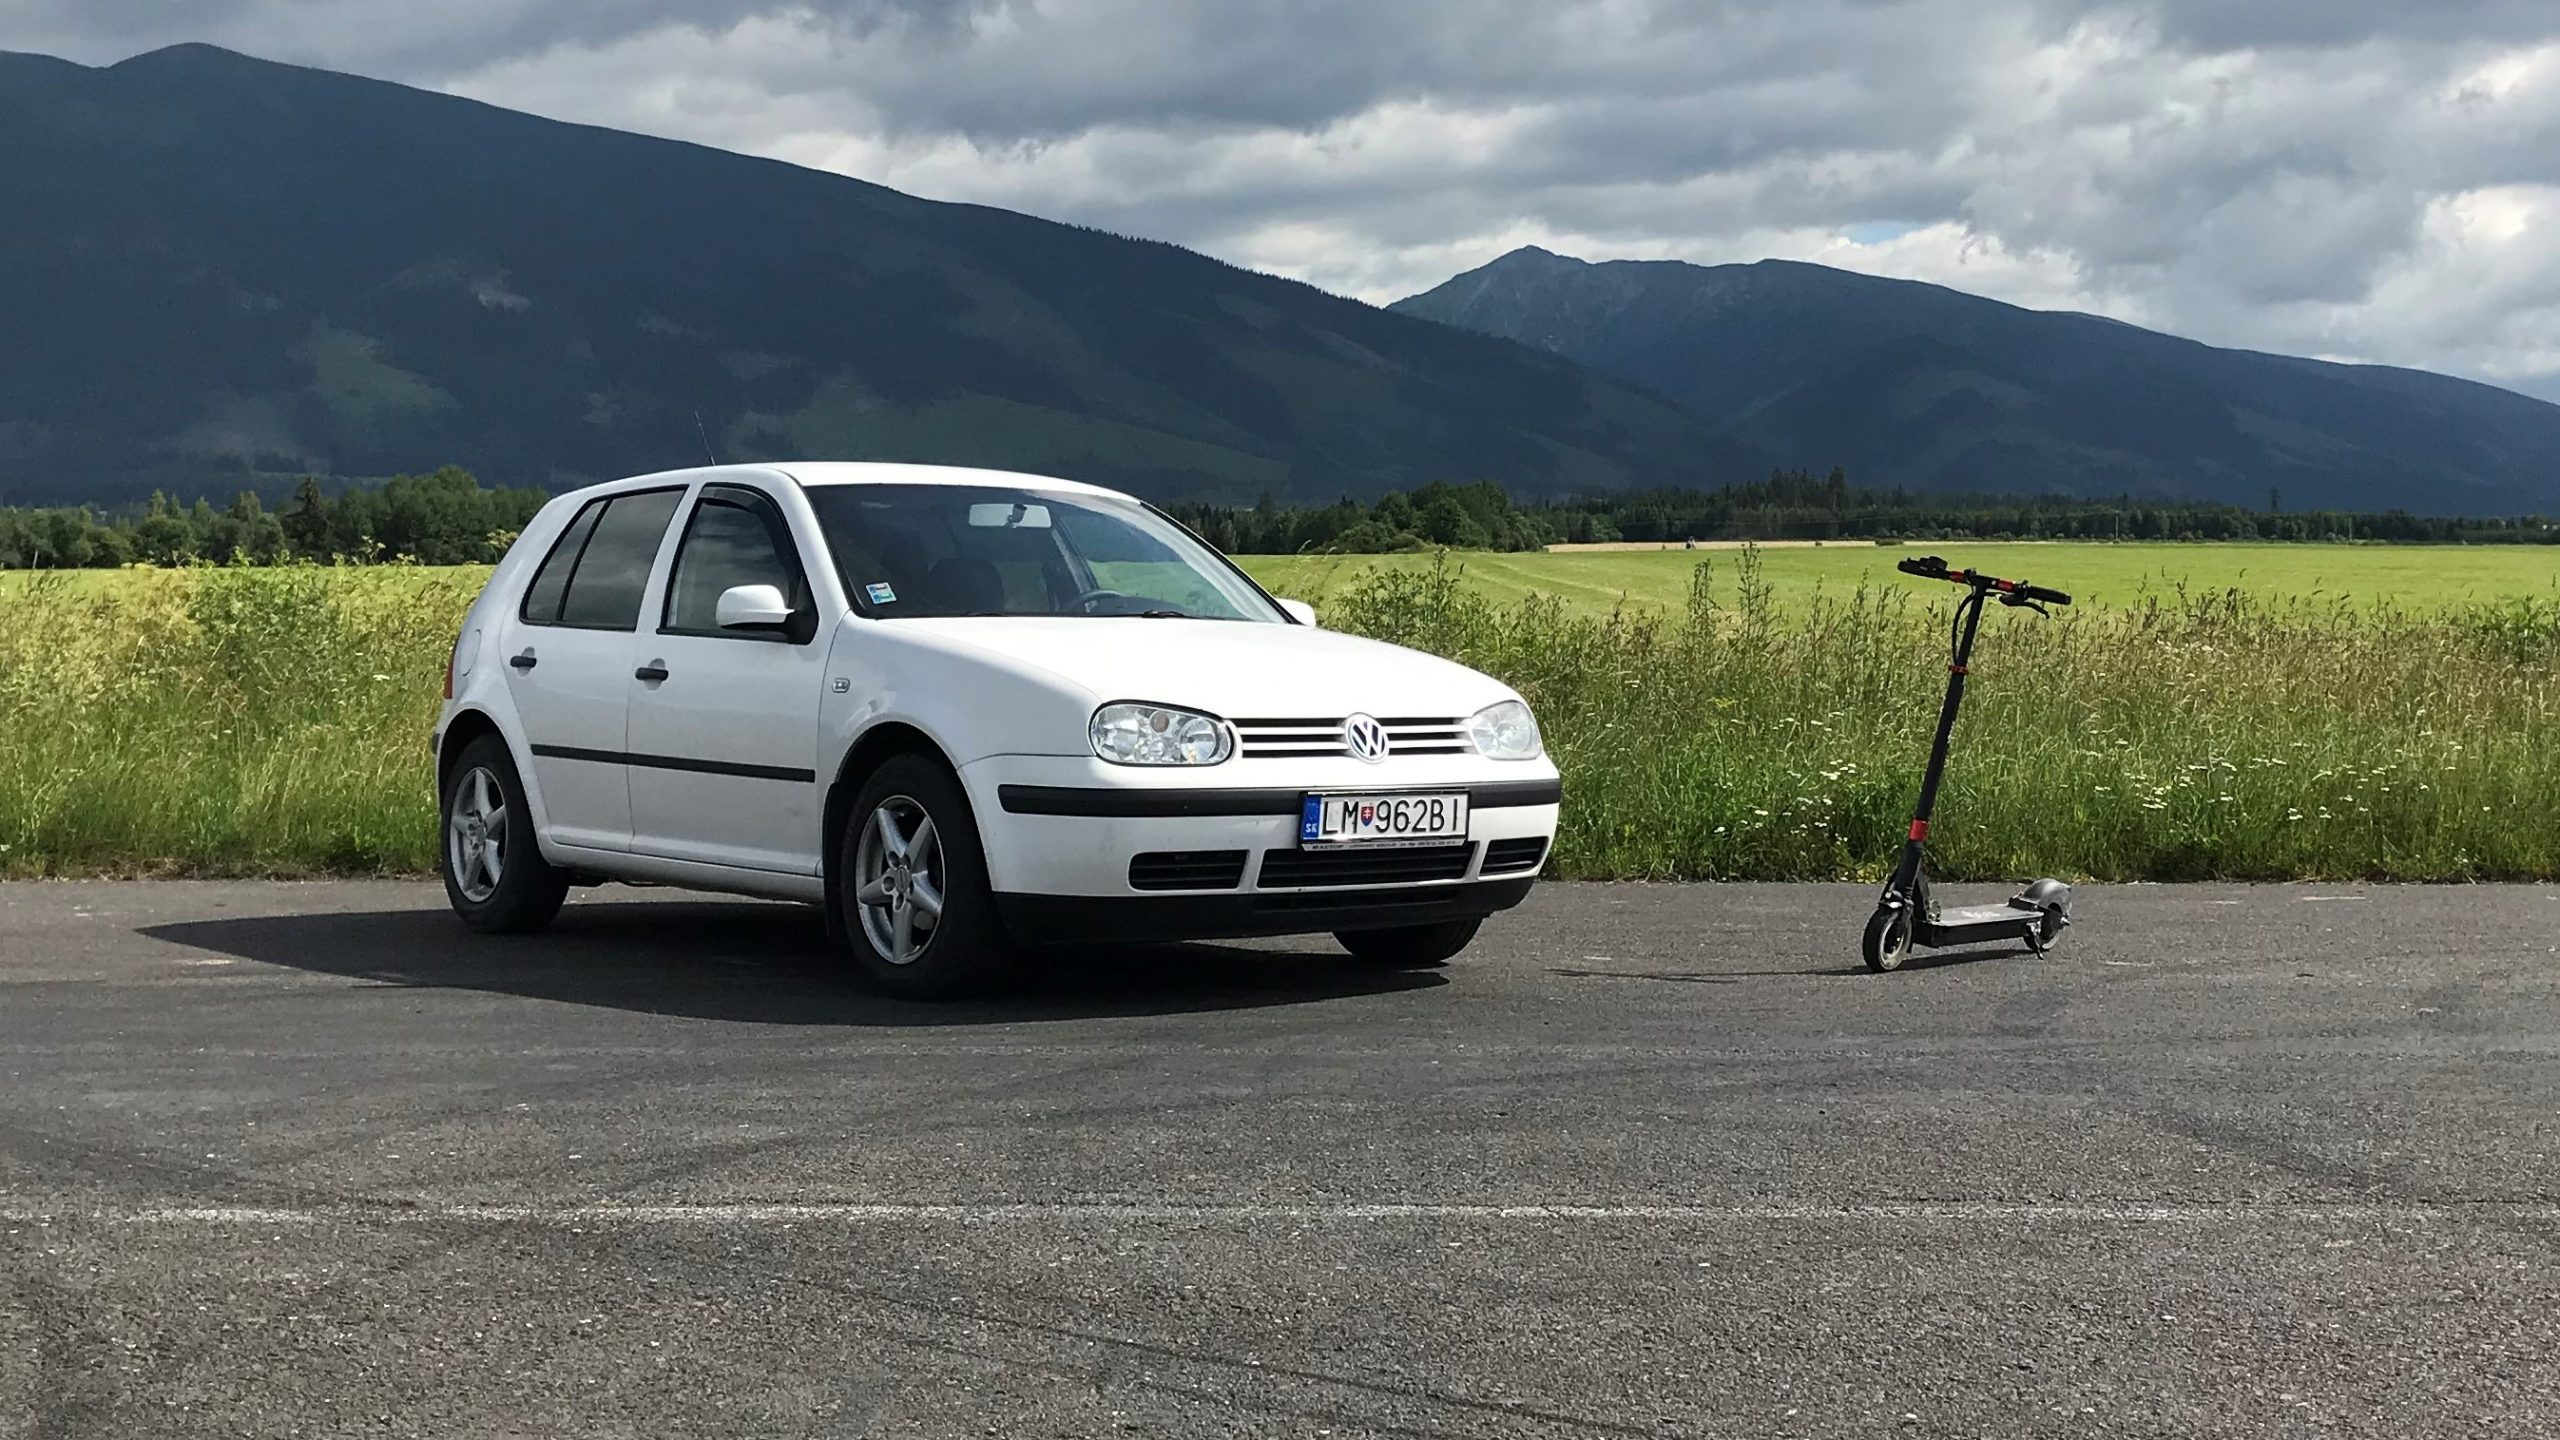 Volkswagen Golf 1.9 sdi vs elektrická kolobežka auto vs kolobežka